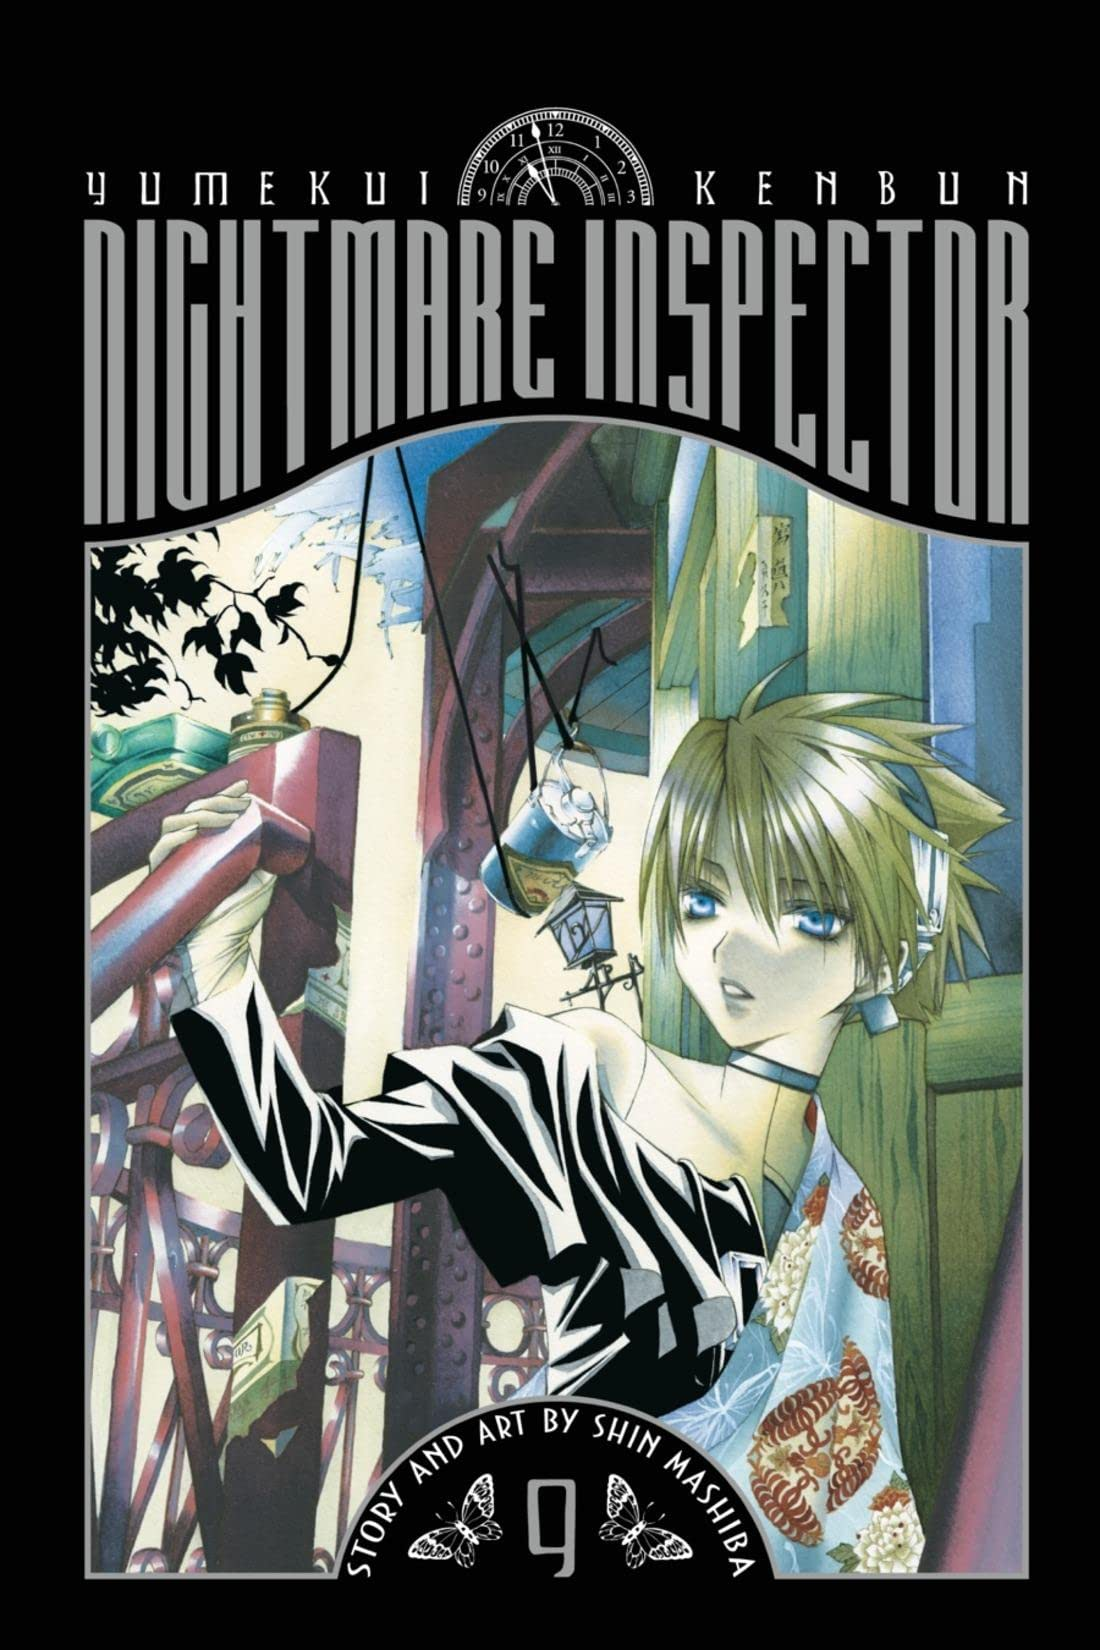 Nightmare Inspector: Yumekui Kenbun Vol. 9